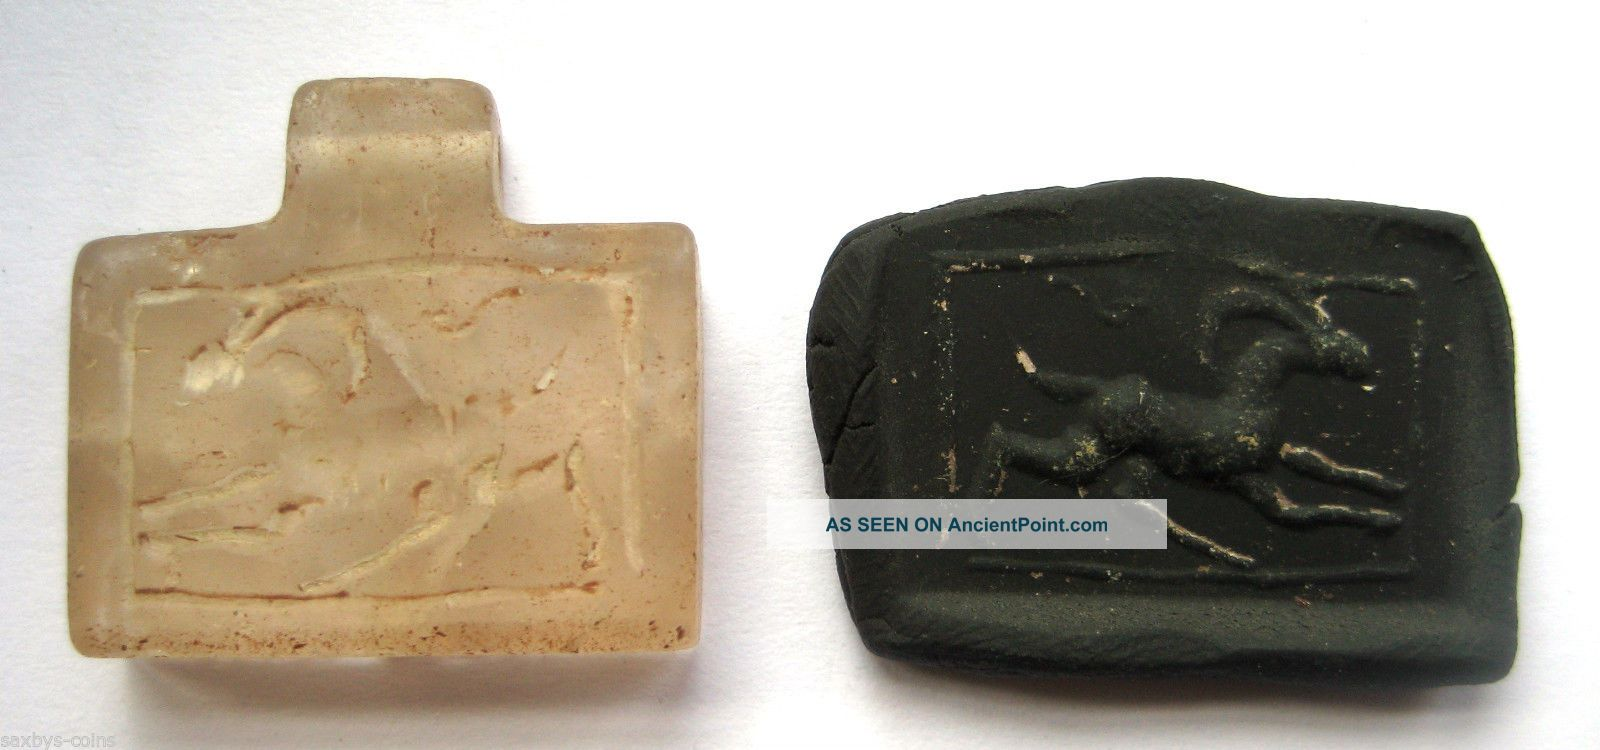 Circa.  400 A.  D Sassanian Empire Zoomorphic Rock Crystal Seal Pendant - Ibex Near Eastern photo